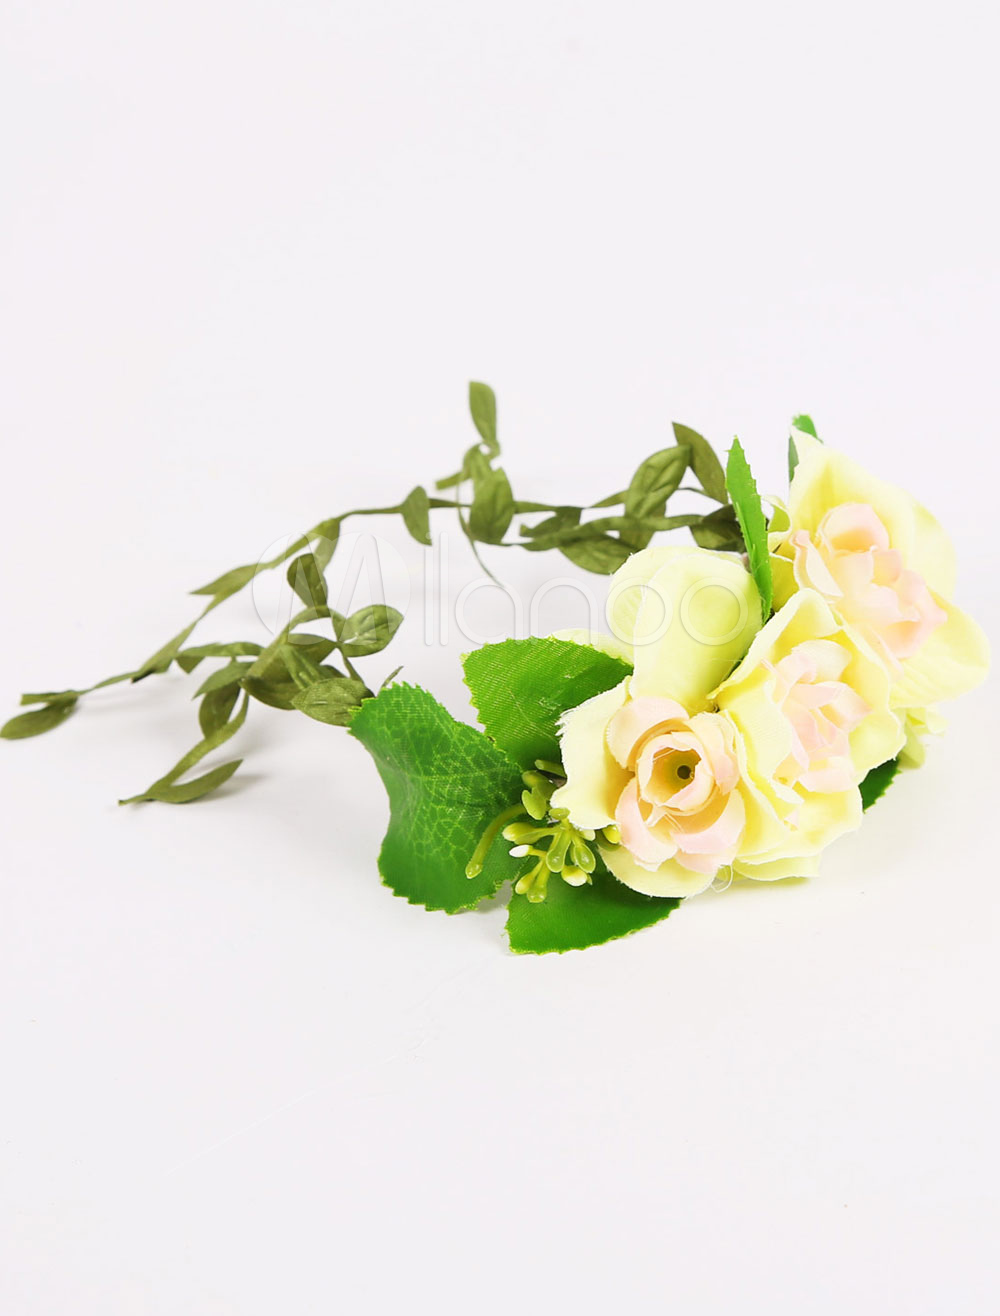 Buy Wedding Bridesmaid Flower Wrist Corsage Evening Silk Prom Flower (8 X 12 X 5 Cm ) for $3.99 in Milanoo store